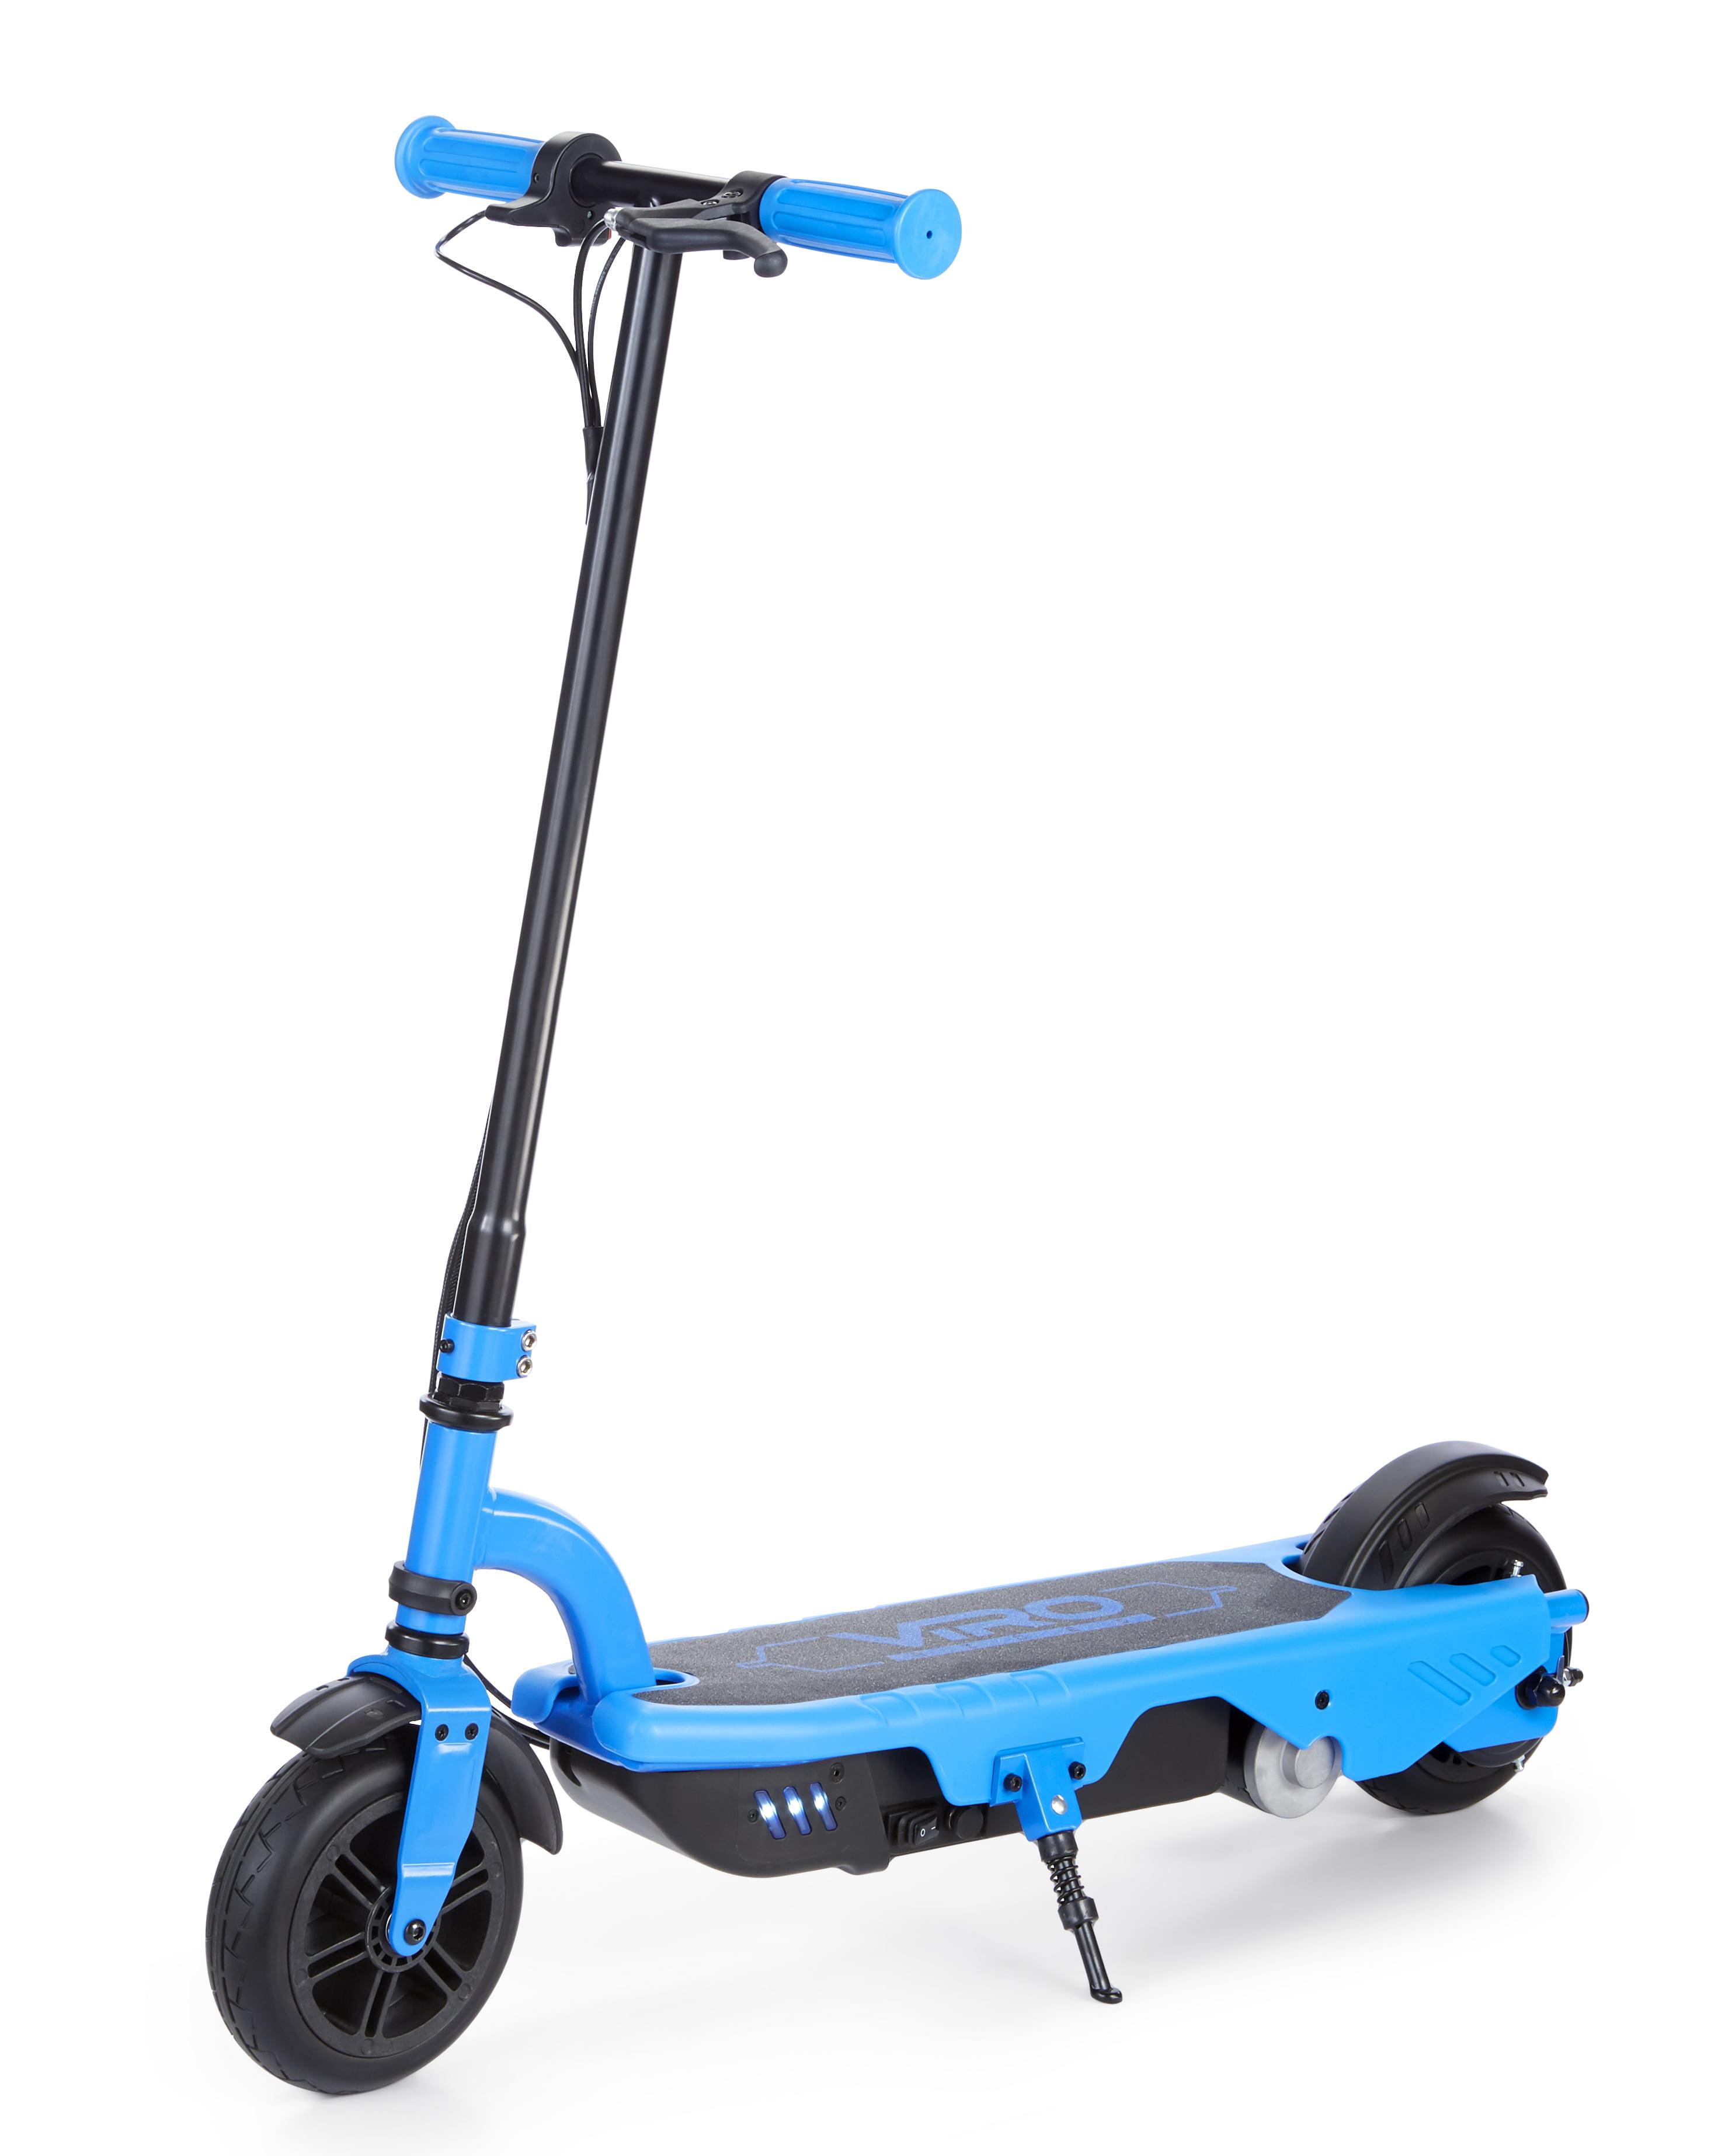 VIRO Rides VR 550E-Blue